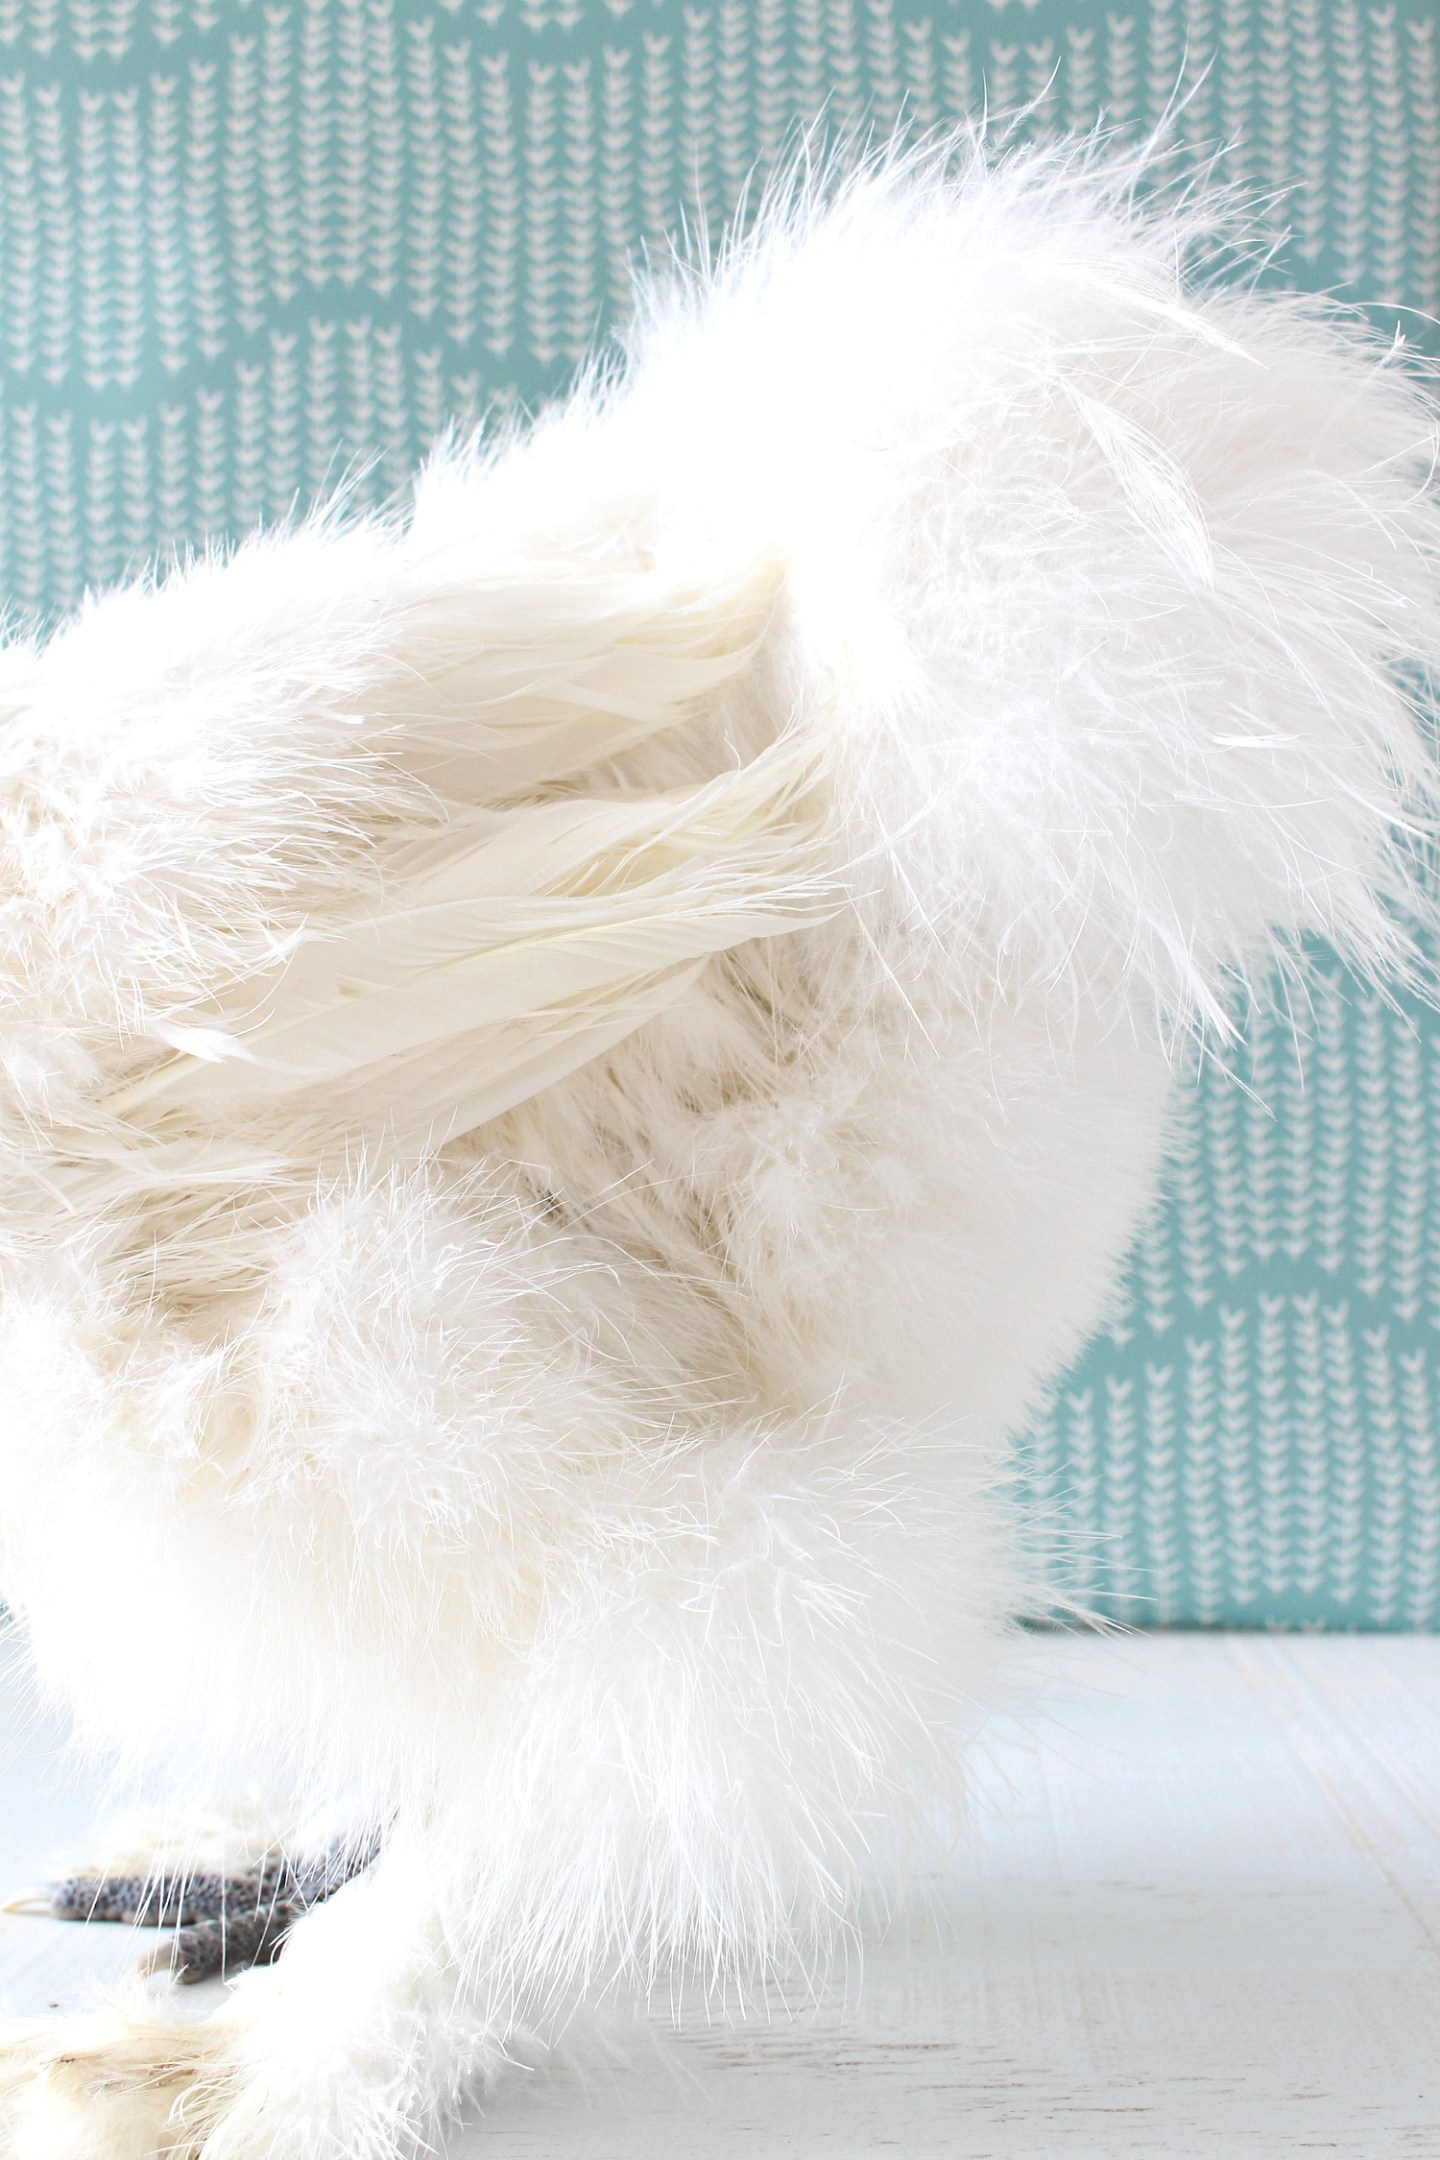 Silkie Chicken Feathers